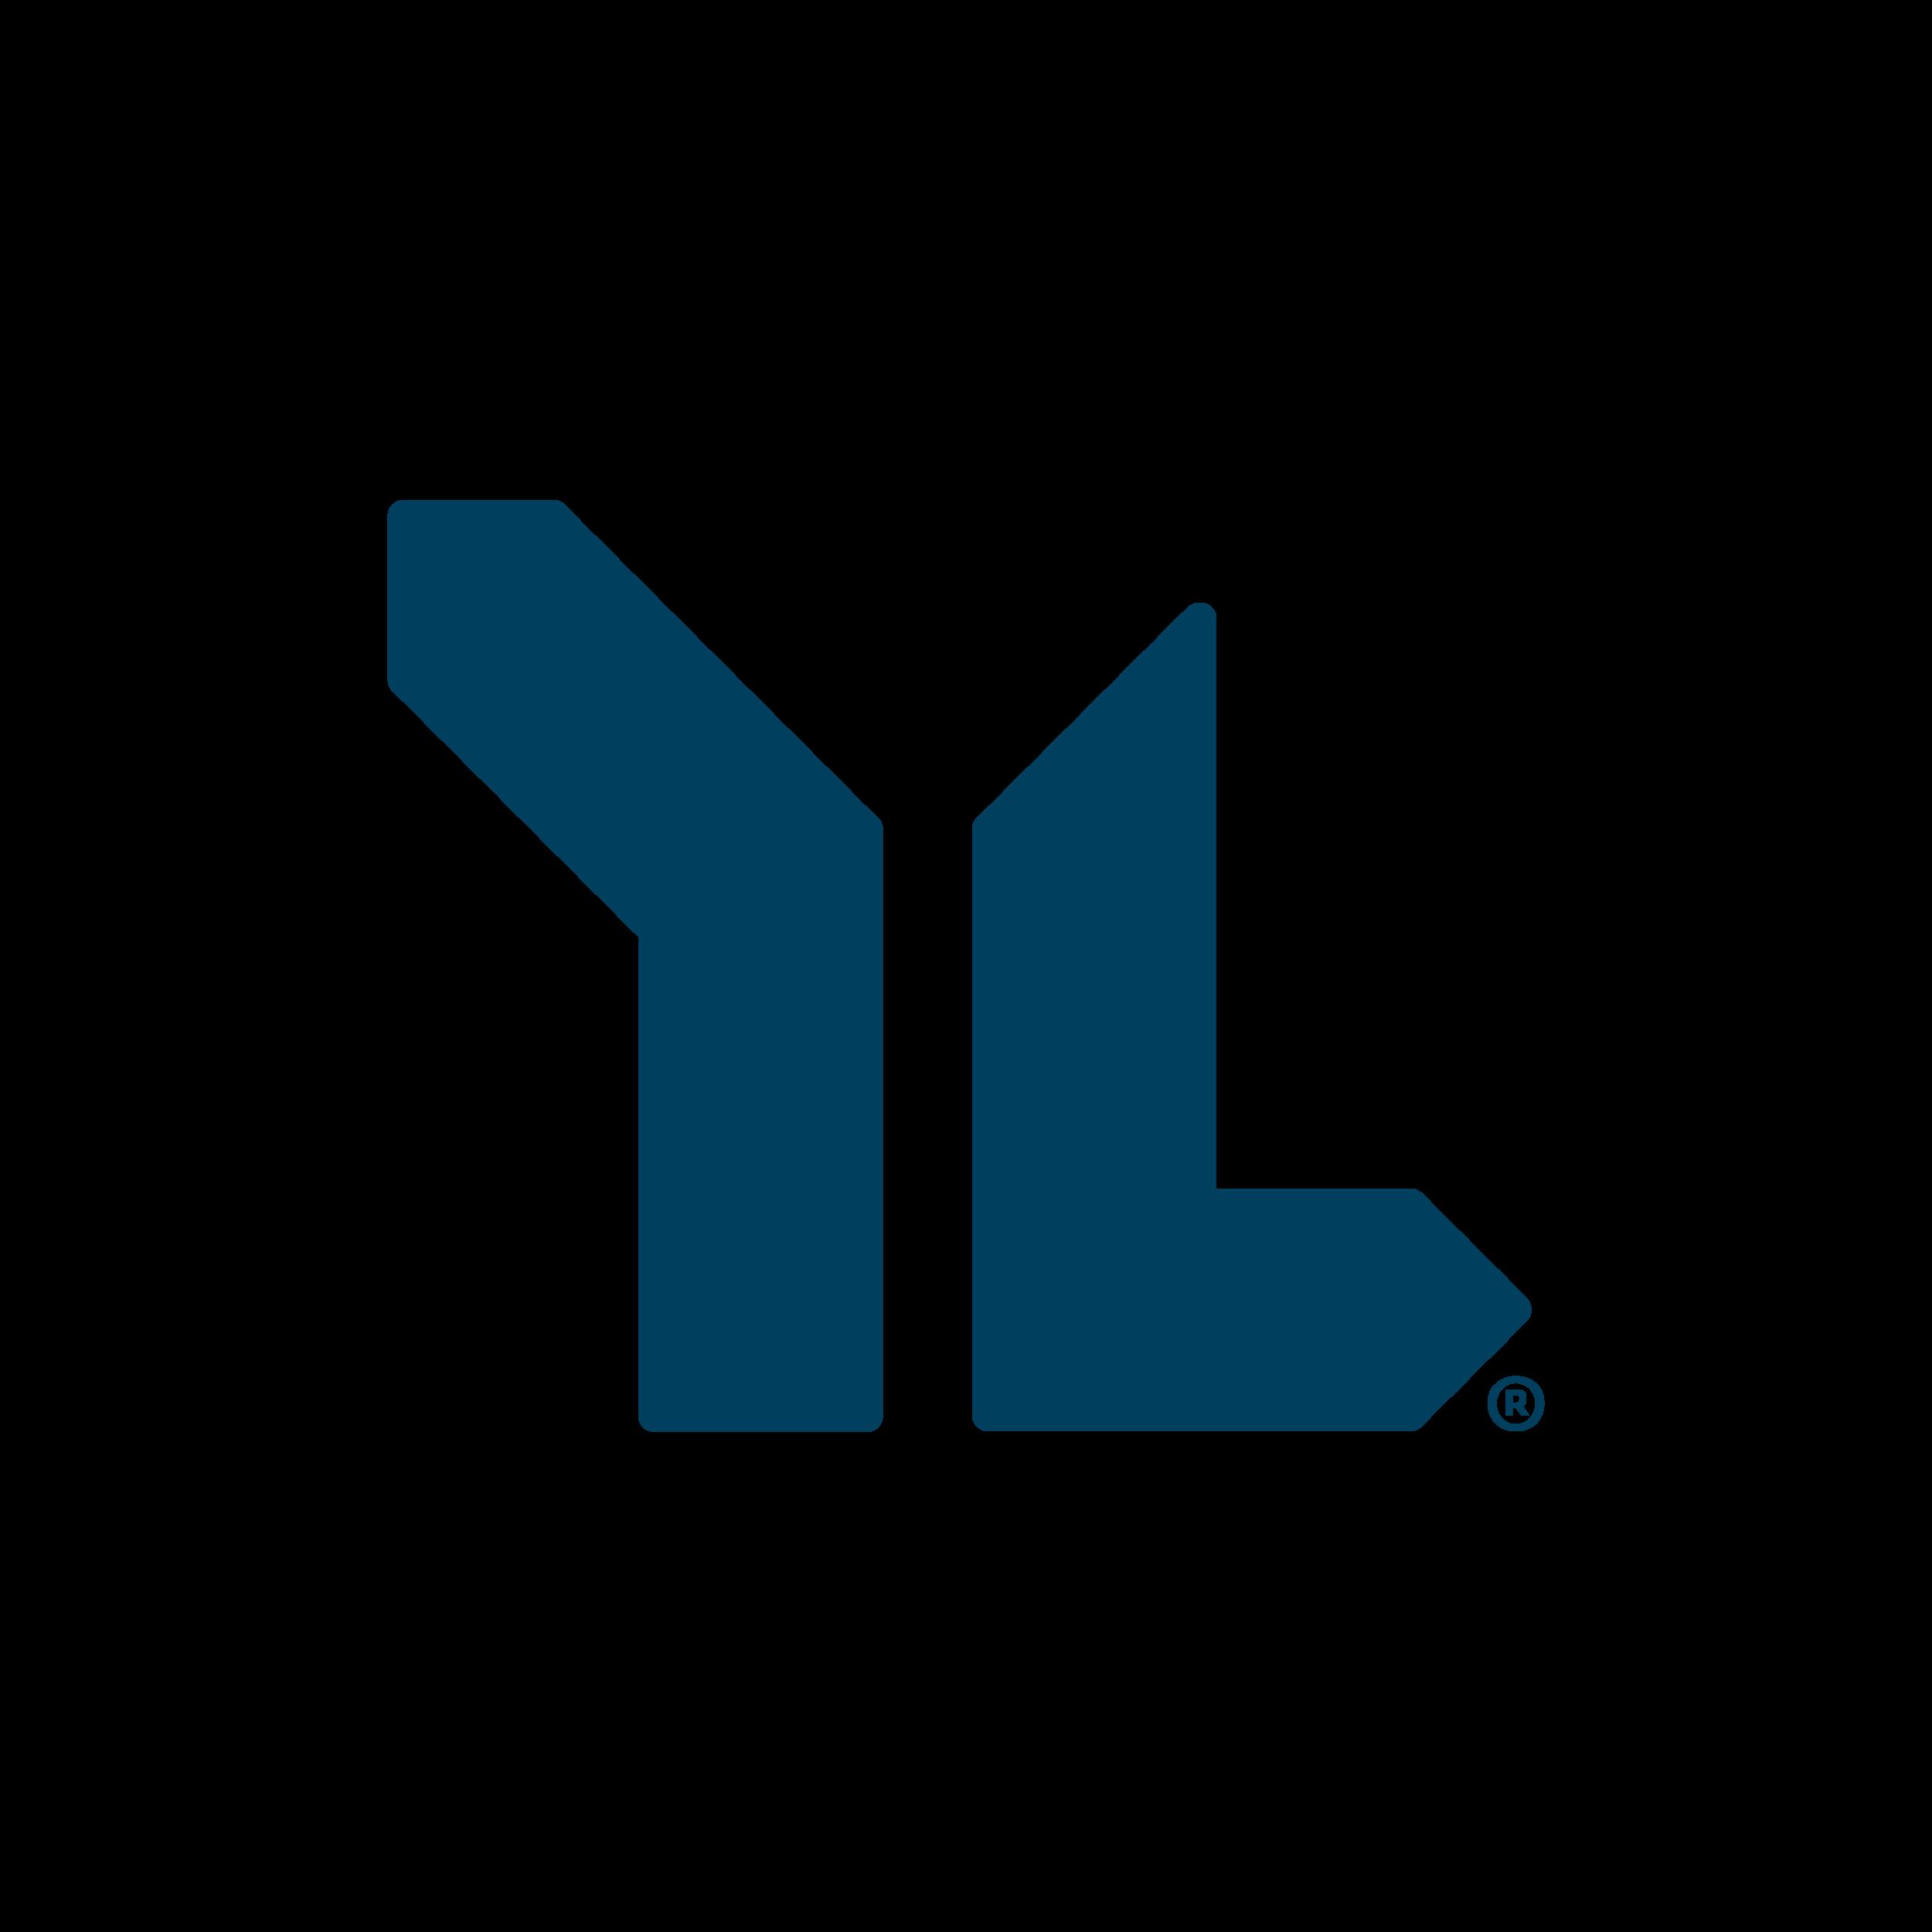 yl-logo.jpg